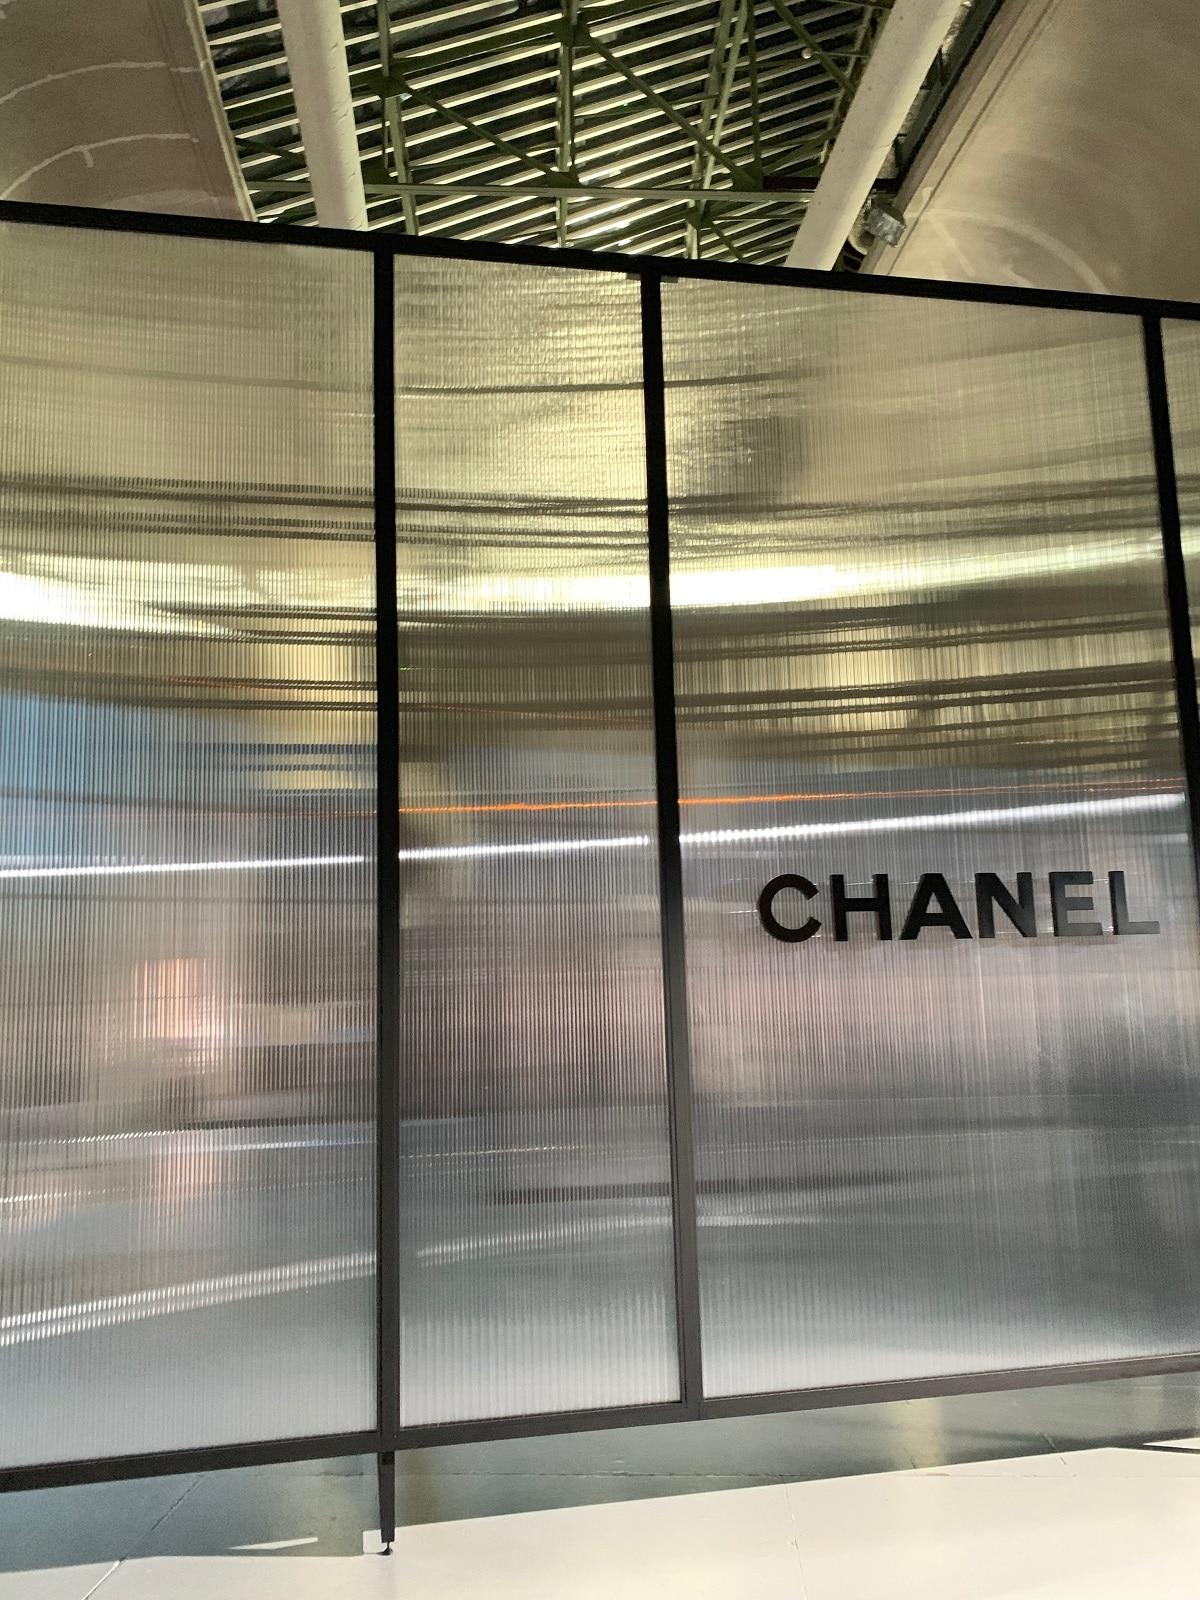 9_Chanel art (2)